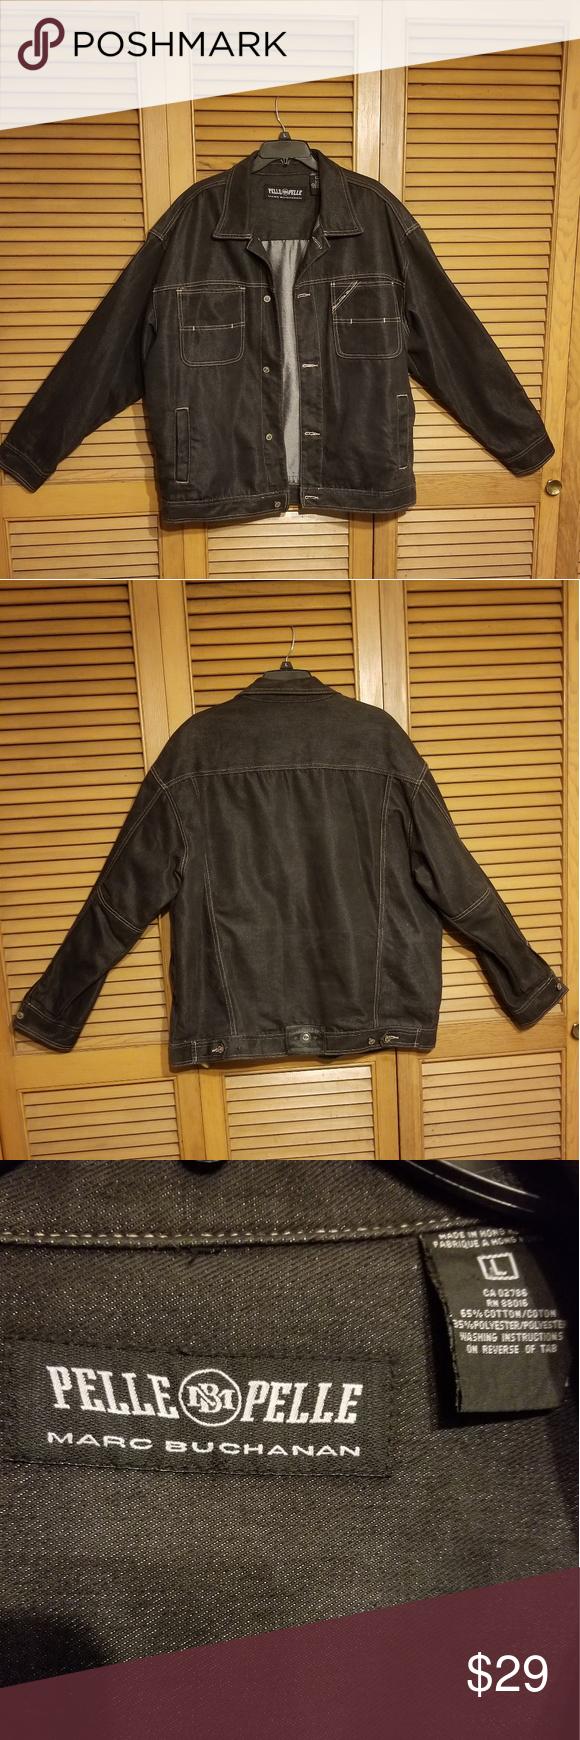 Marc Buchanan Pelle Pelle Jean Jacket Clothes Design Jackets Jean Jacket [ 1740 x 580 Pixel ]